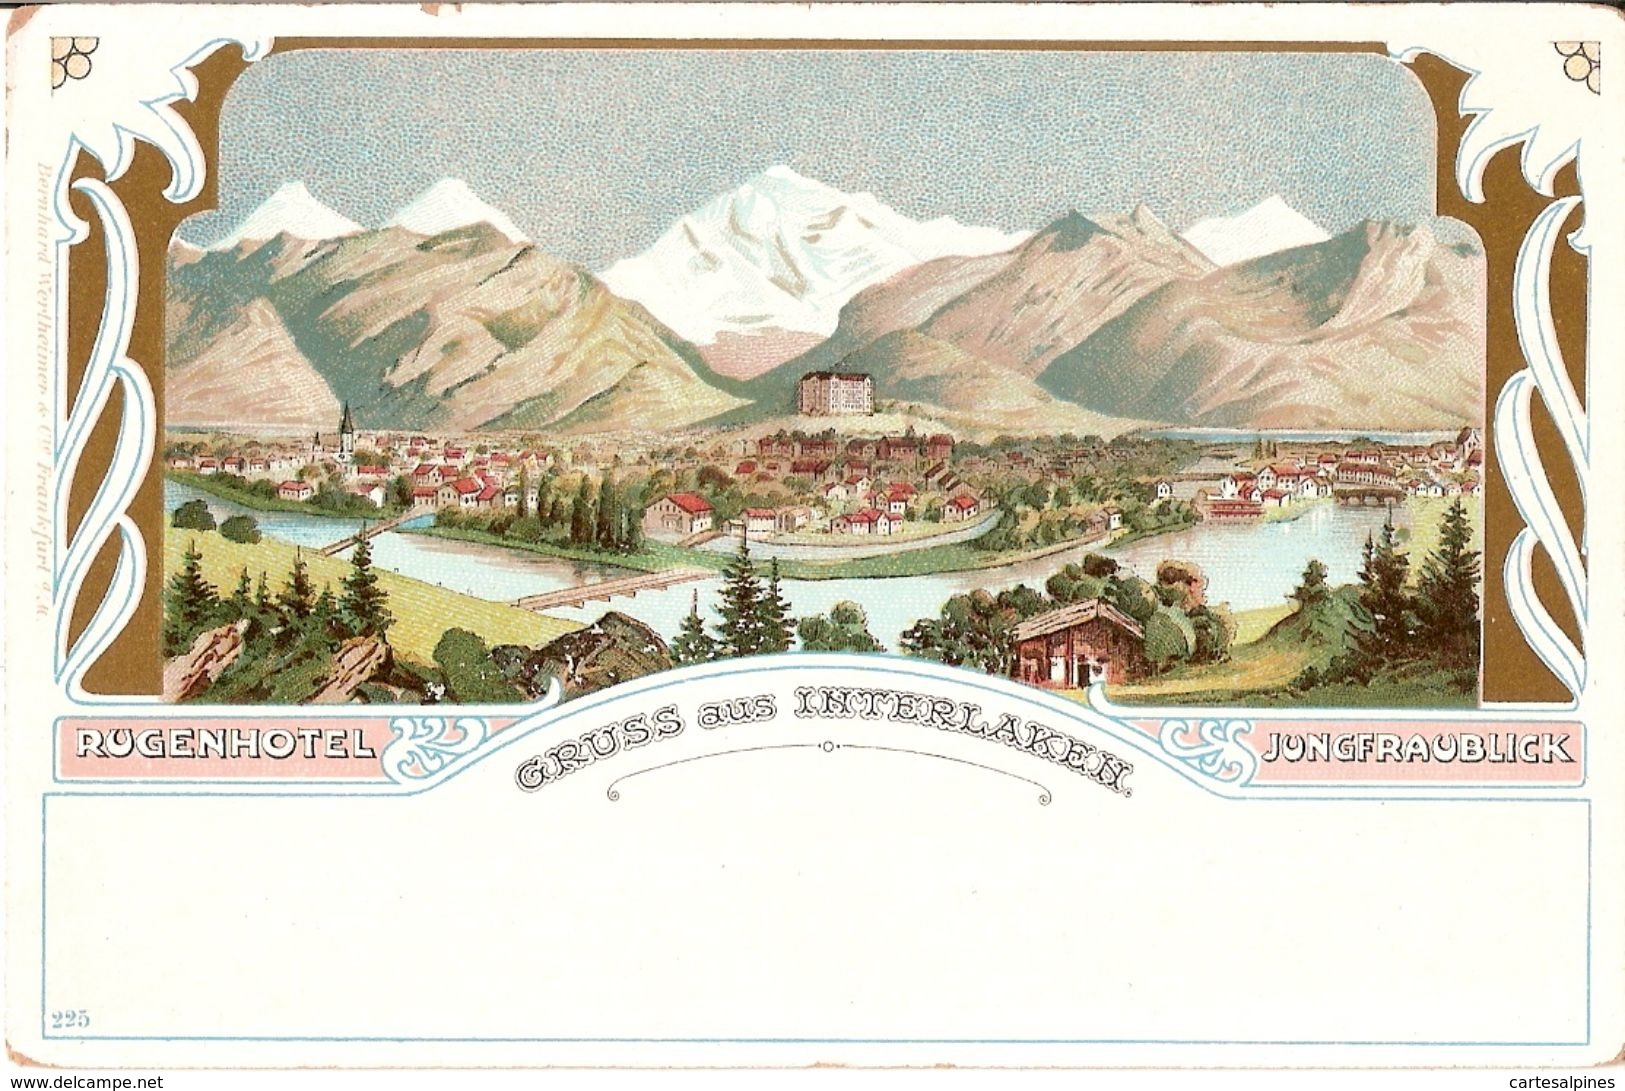 (Suisse) Gruss Aus Interlaken. Rugenhotel. Carte Lithographiée, Vers 1900 - BE Berne